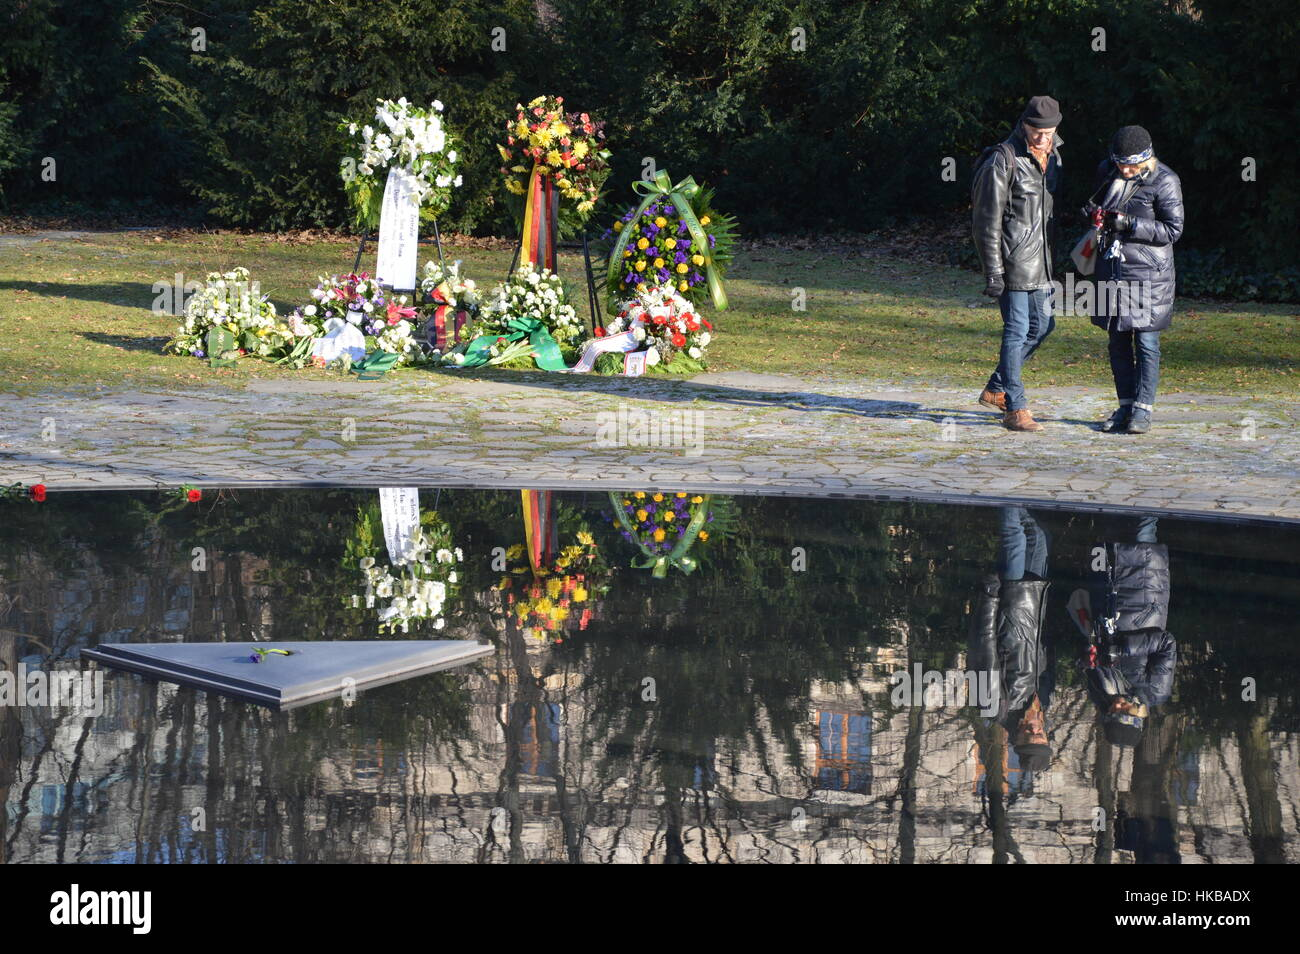 Berlin, Germany. 27th Jan, 2017 - International Holocaust Remembrance Day in Berlin Credit: Markku Rainer Peltonen/Alamy - Stock Image